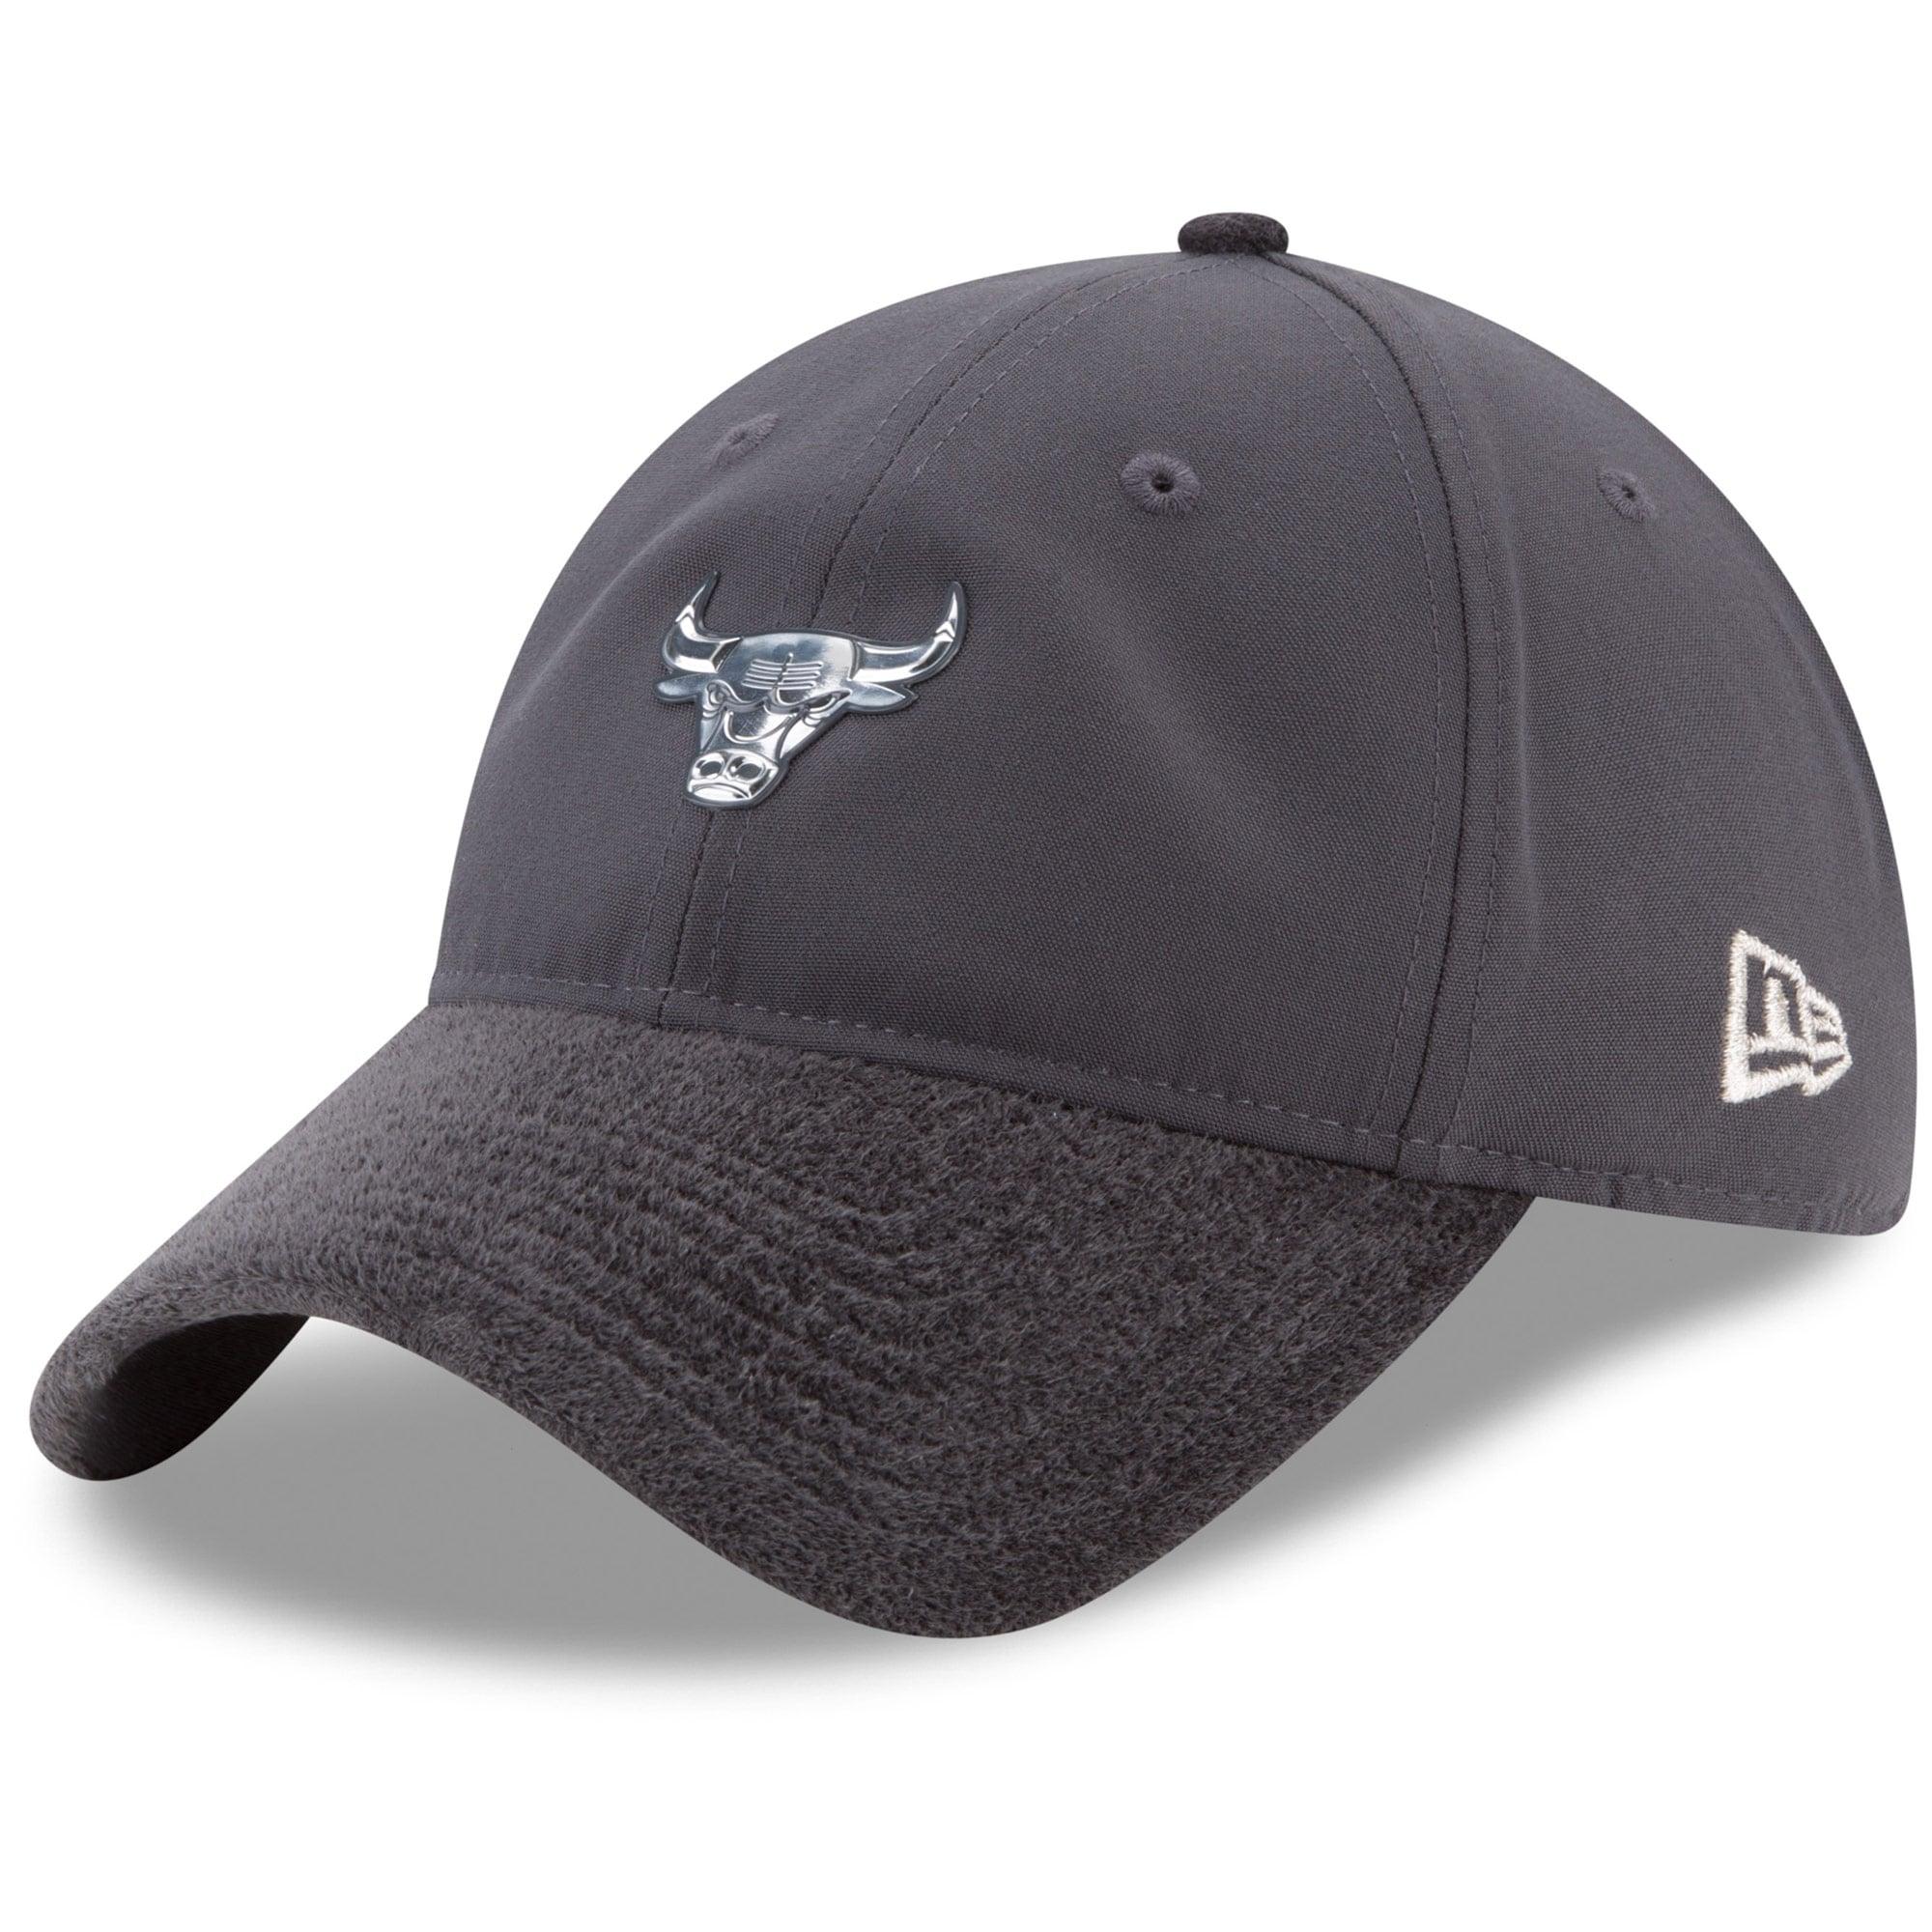 Chicago Bulls New Era On-Court Silver Logo 9TWENTY Adjustable Hat - Graphite